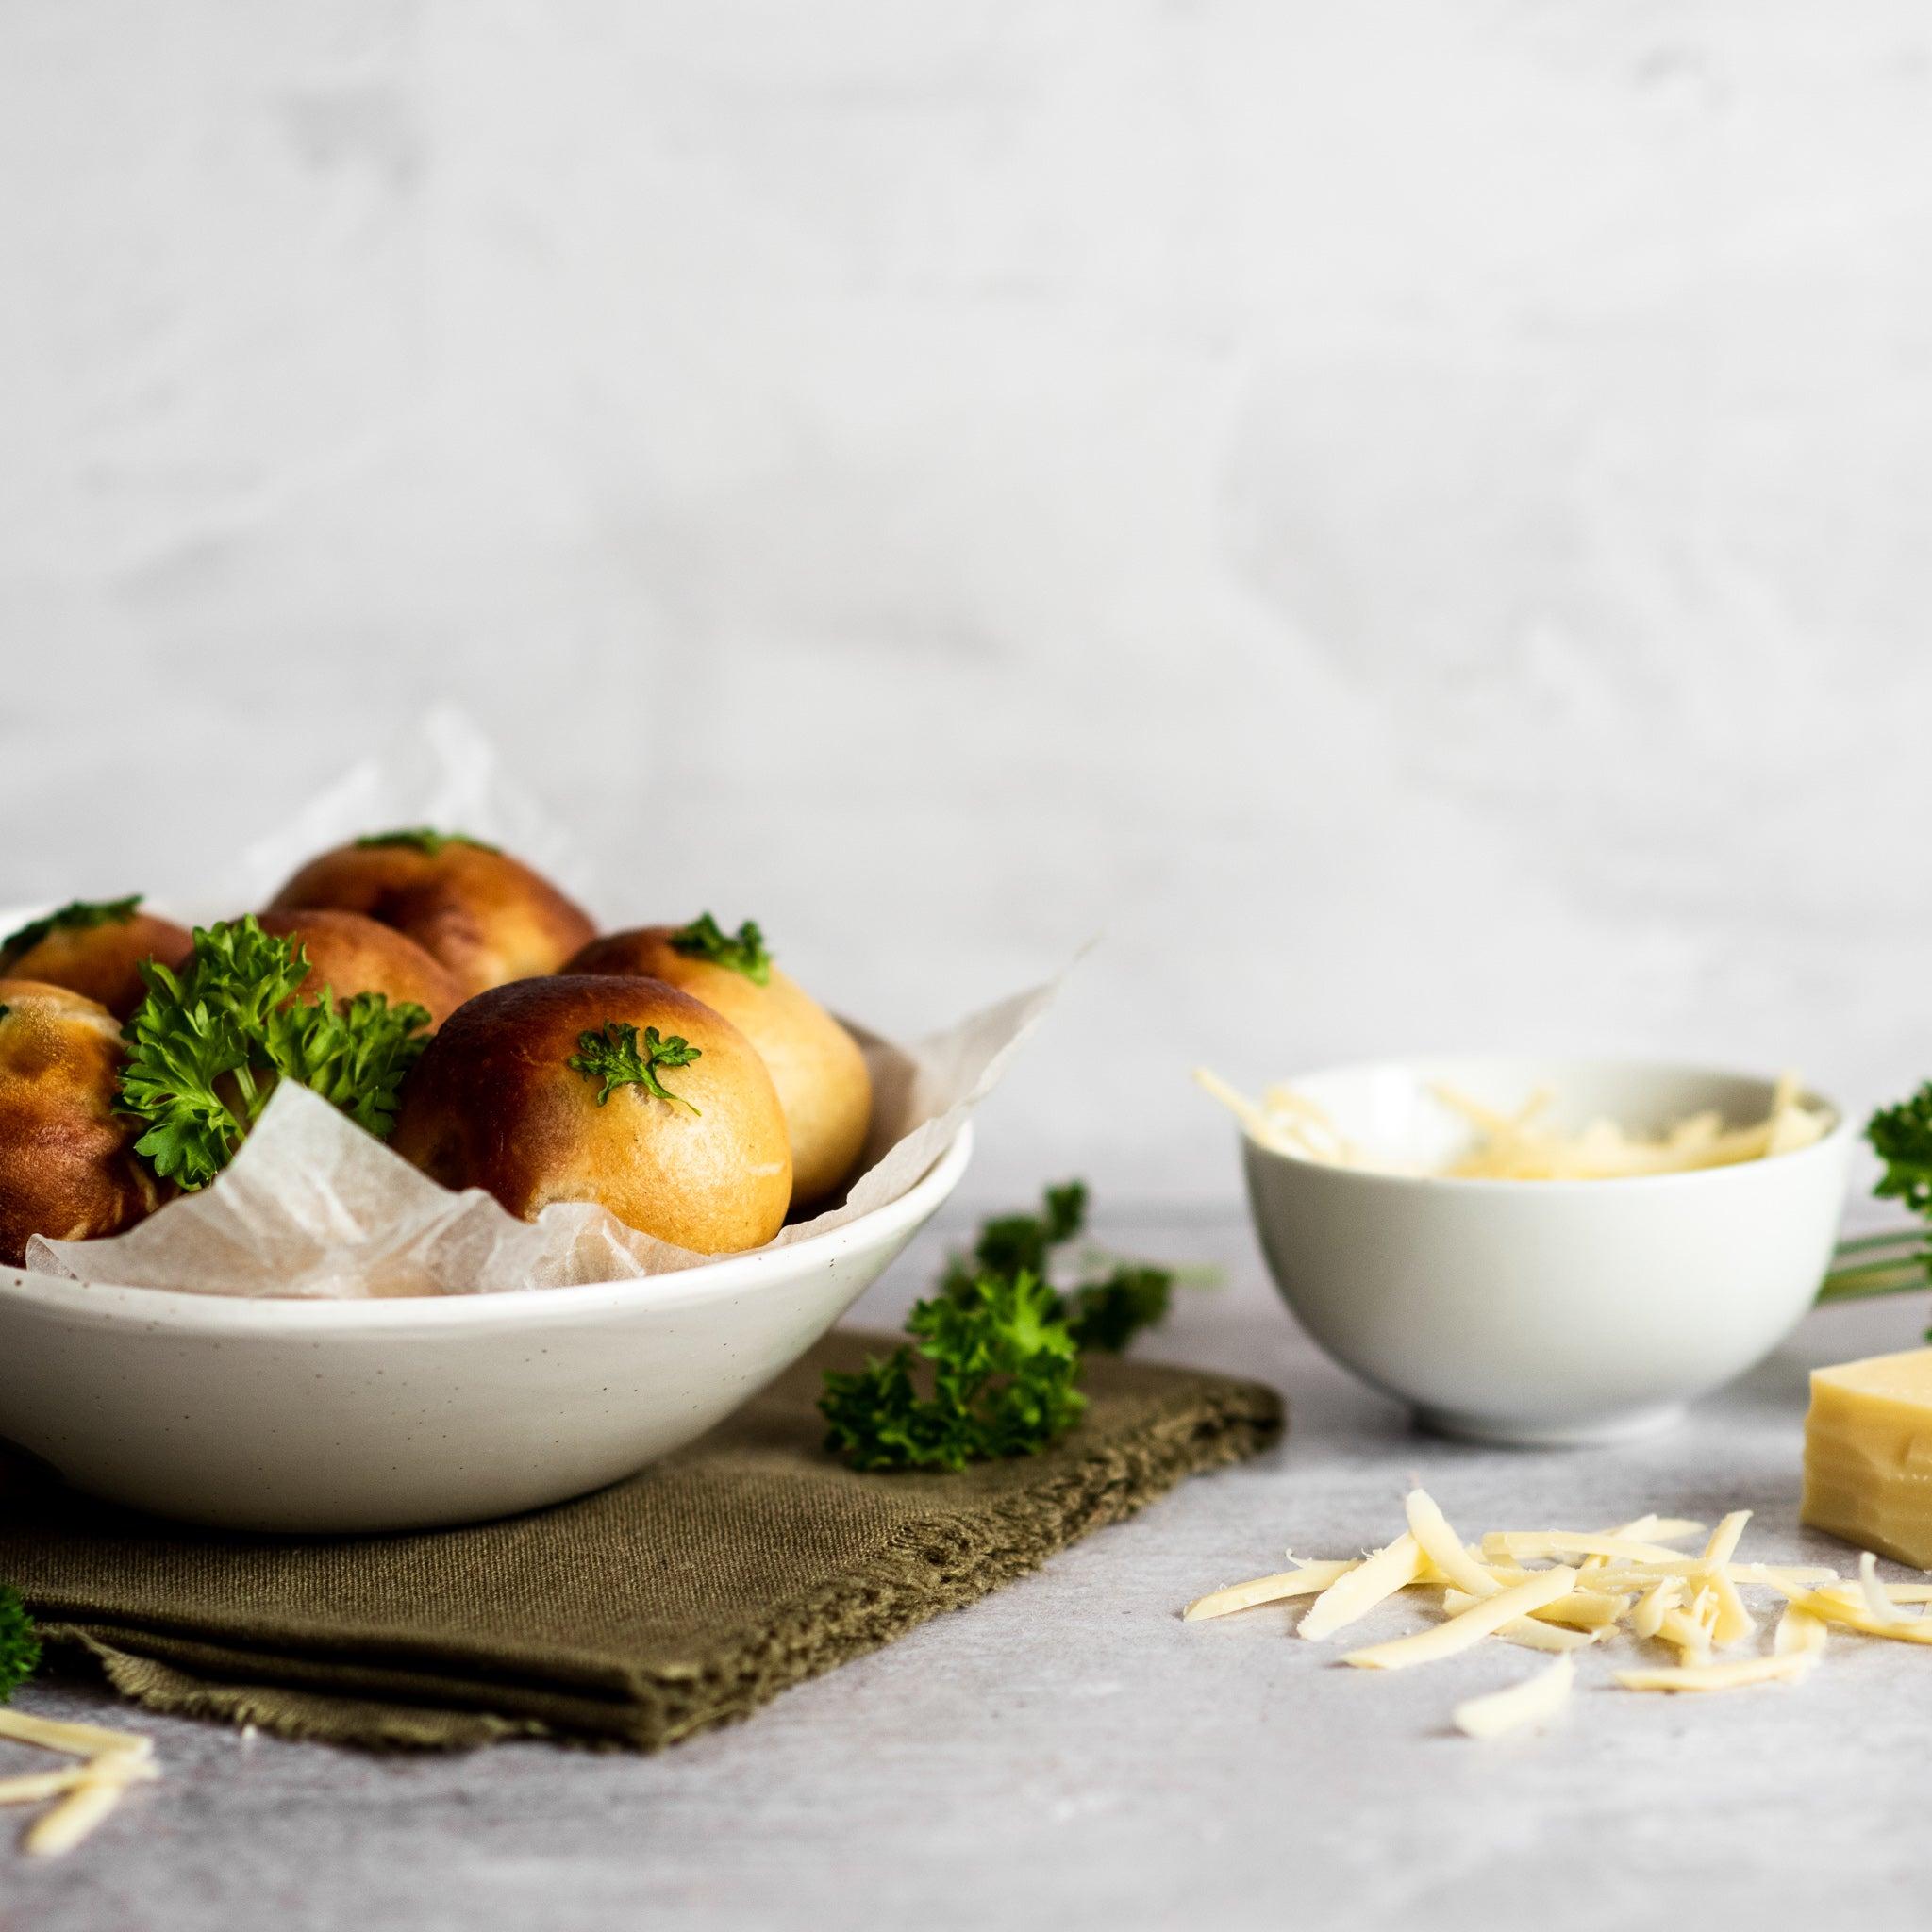 Gruyere-and-Pancetta-Pretzel-Bites-SQUARE-3.jpg